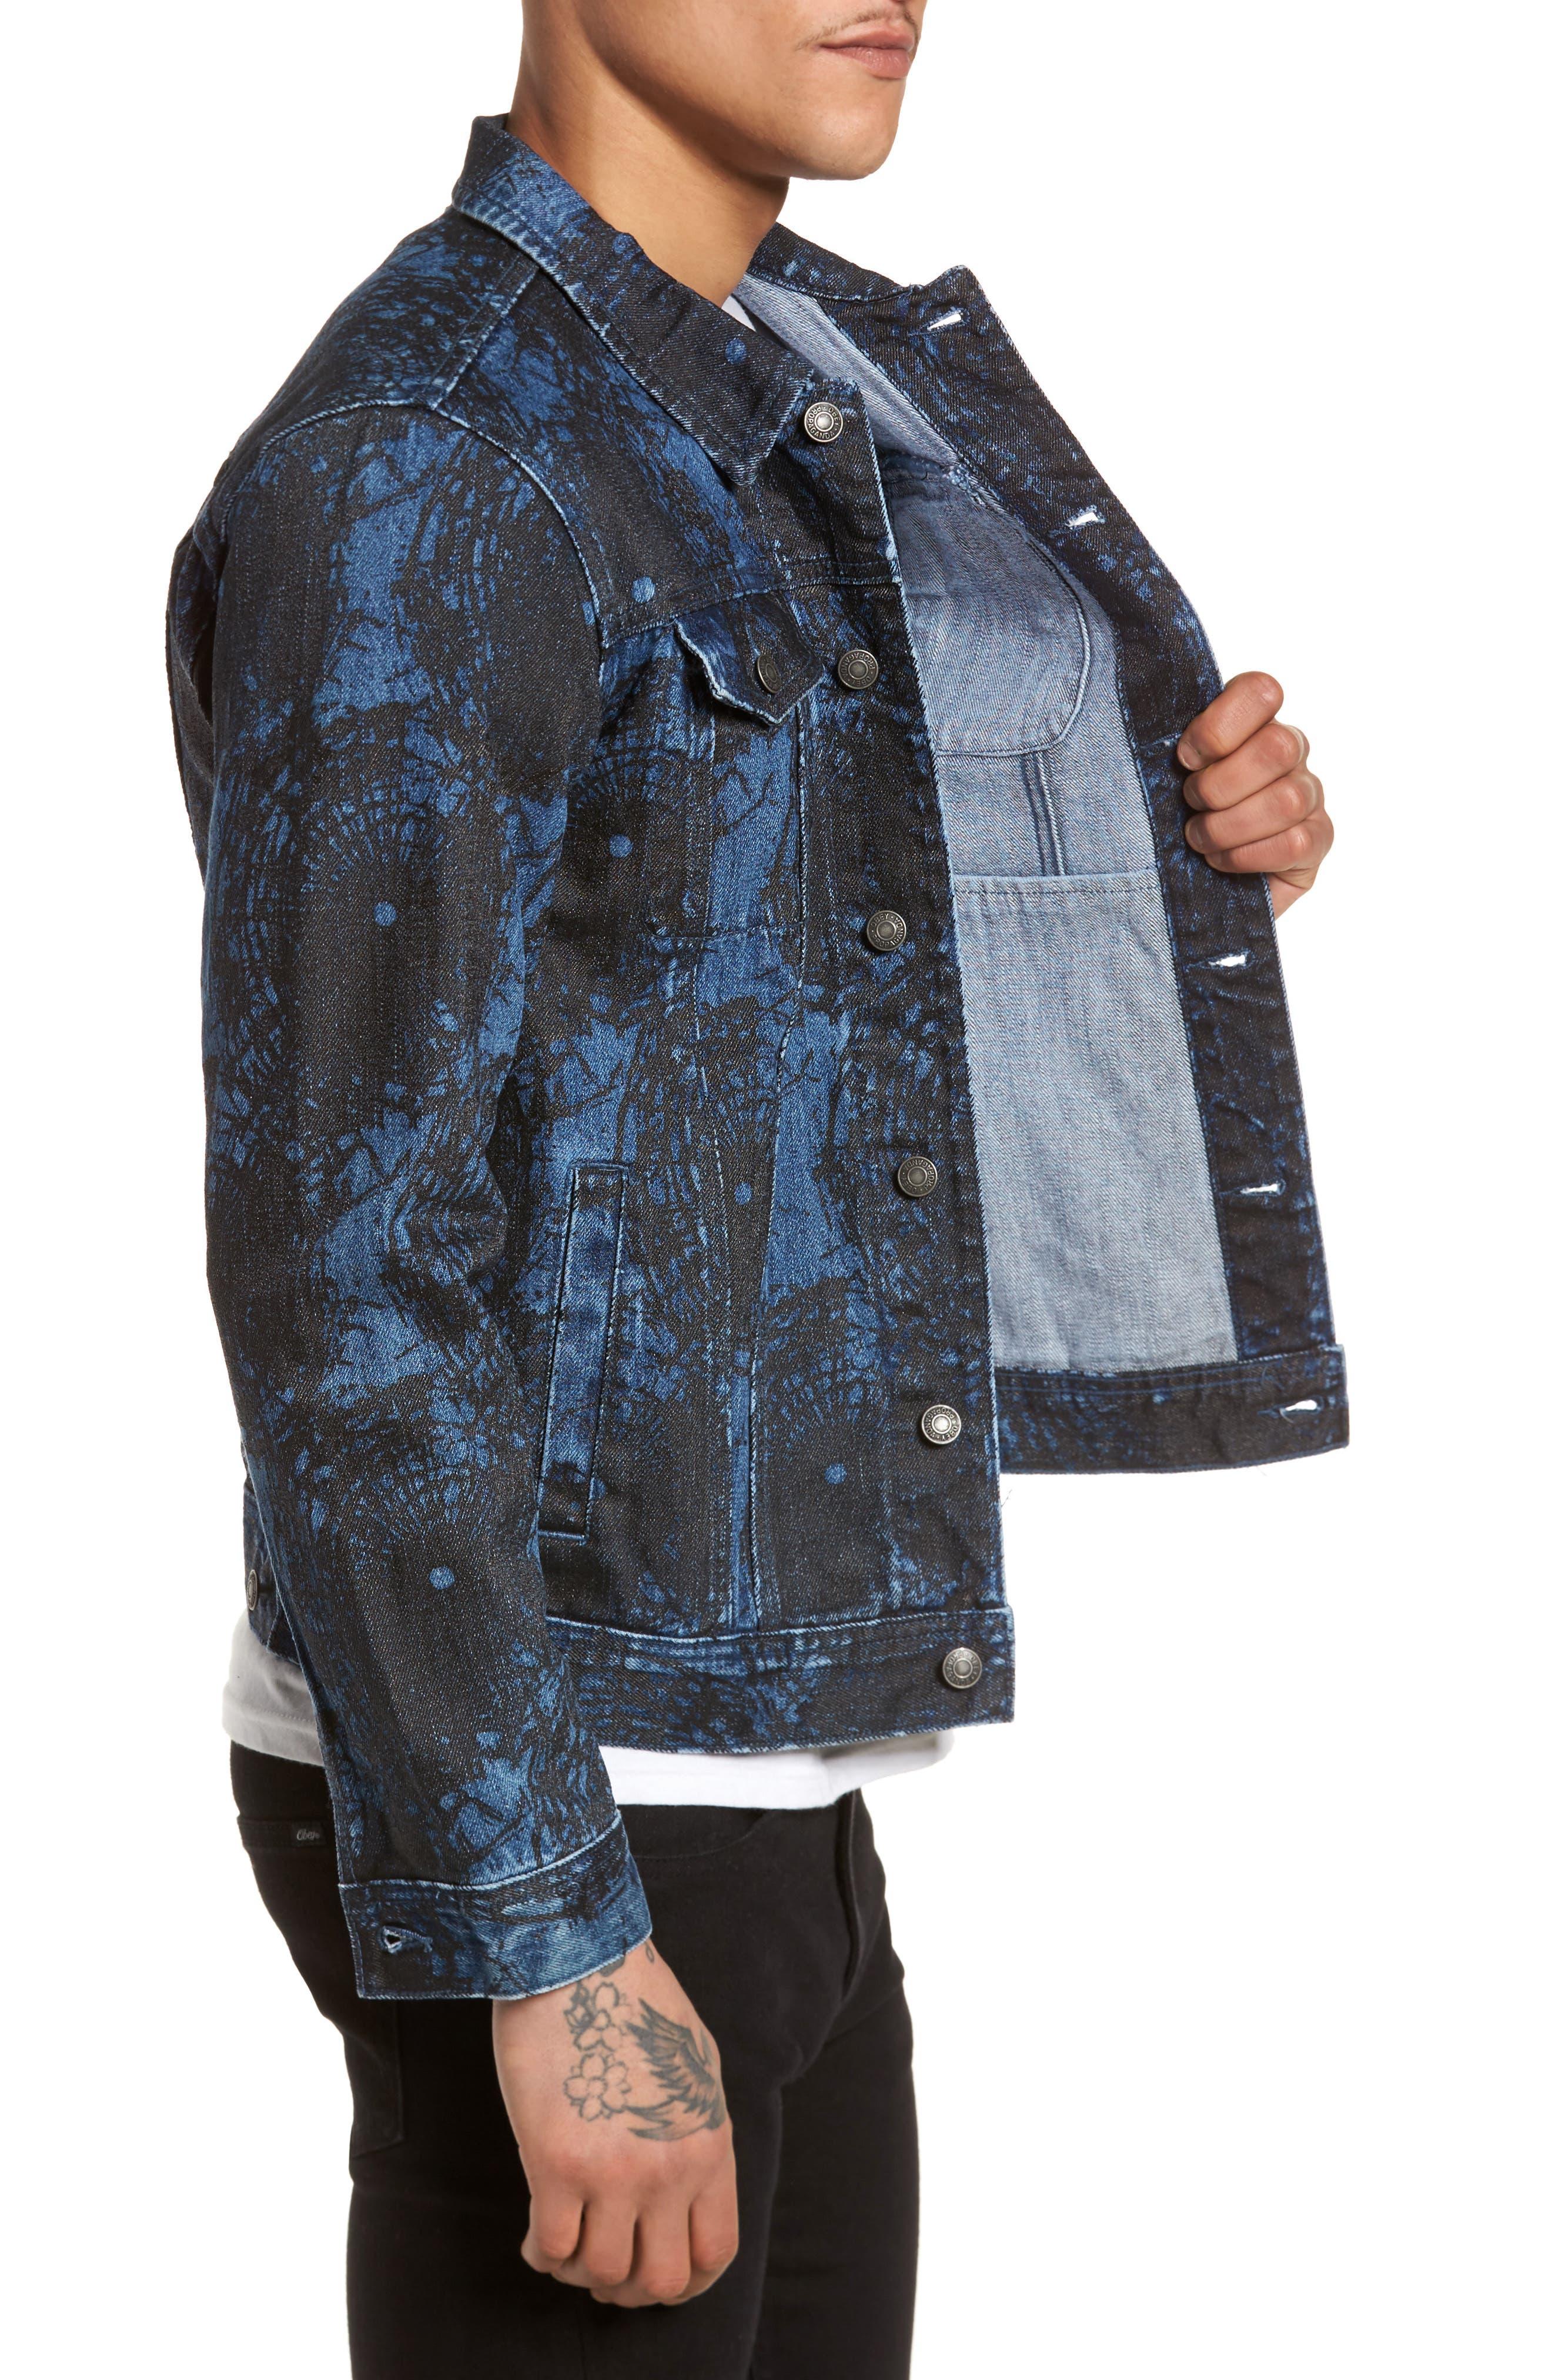 Shattered Denim Jacket,                             Alternate thumbnail 3, color,                             002